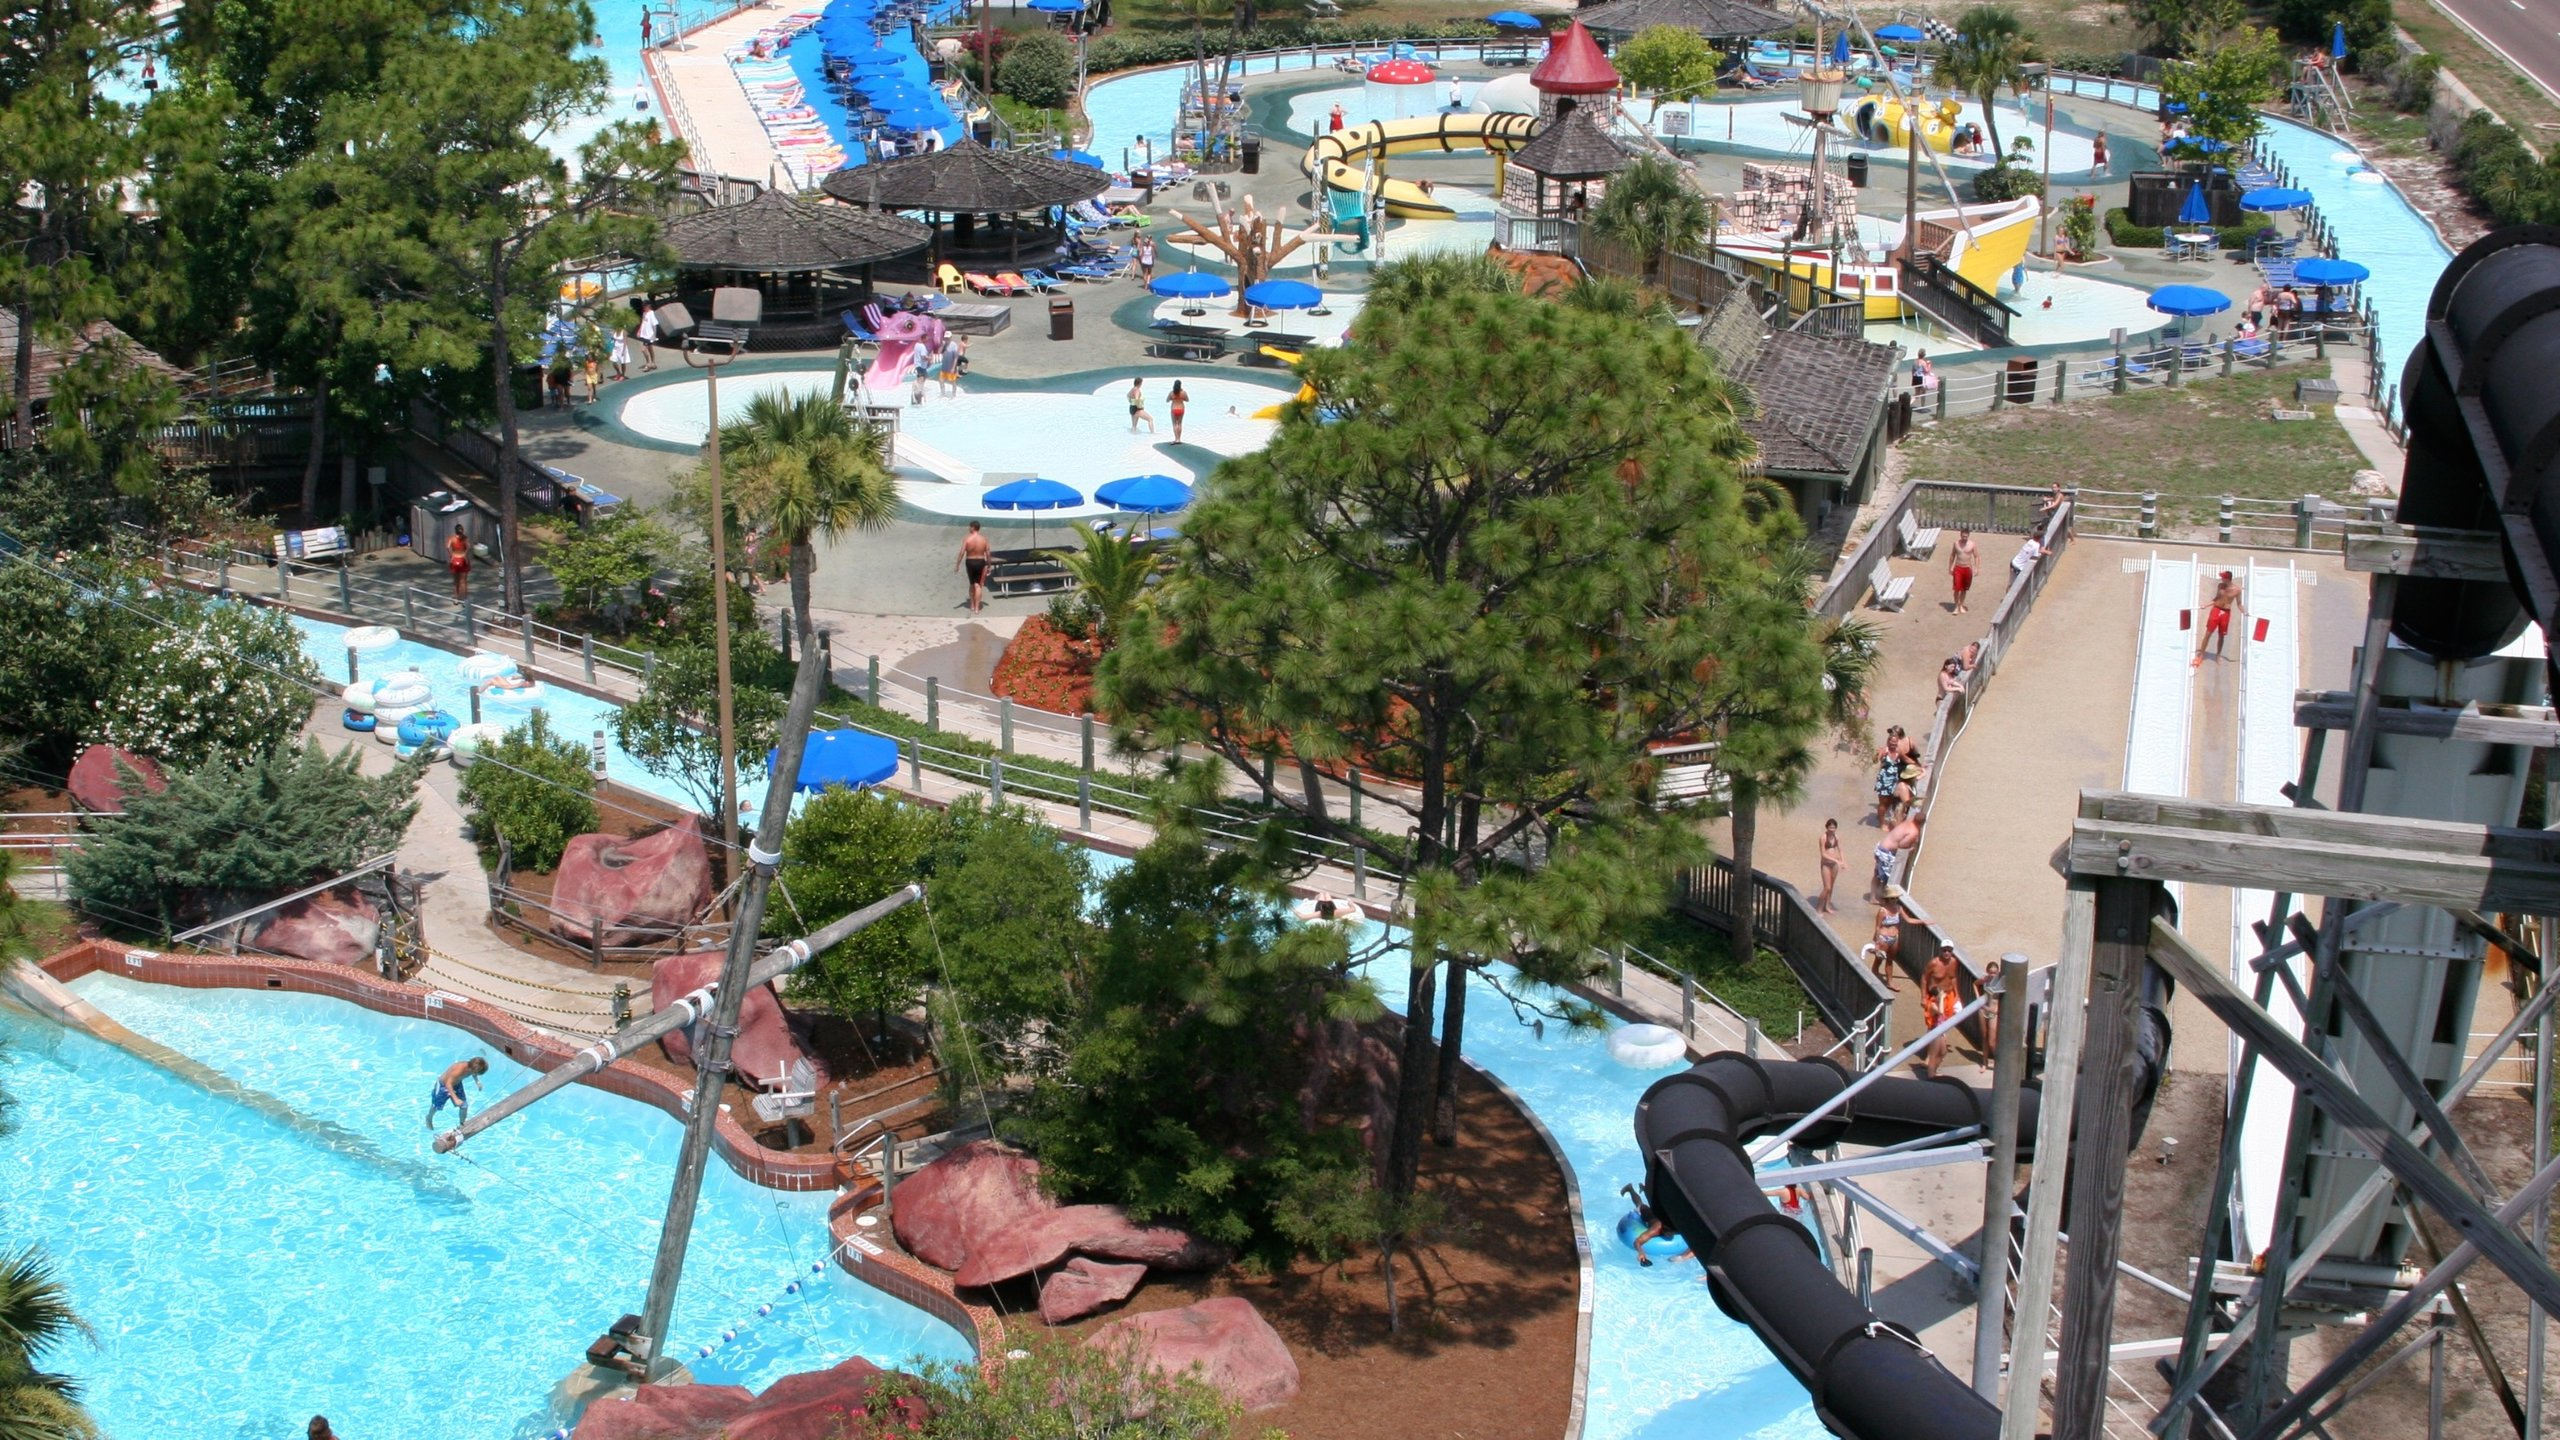 Top 10 Waterpark Hotels In Panama City Beach, FL $116